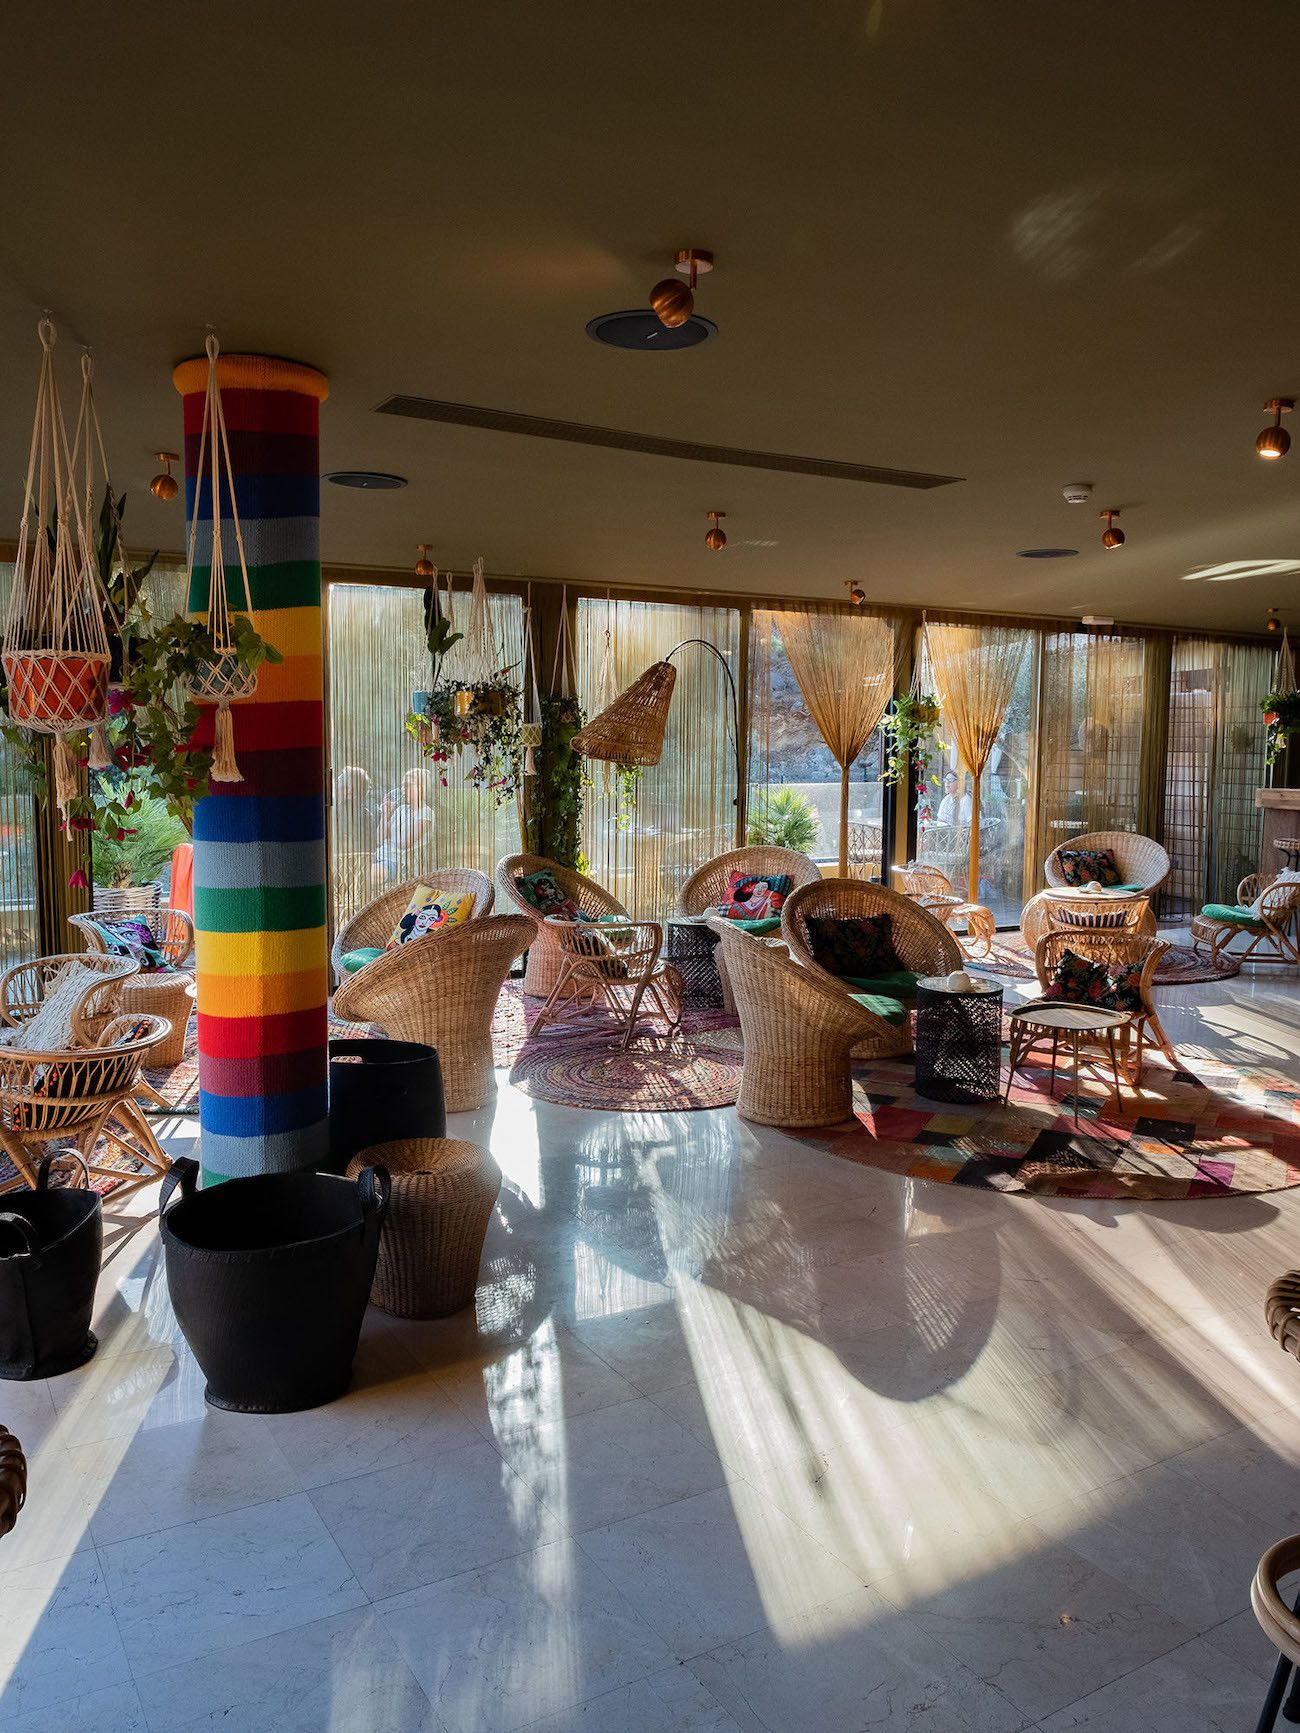 Foodblog About Fuel, Bikini Island & Mountain Hotels, Donkey Bar